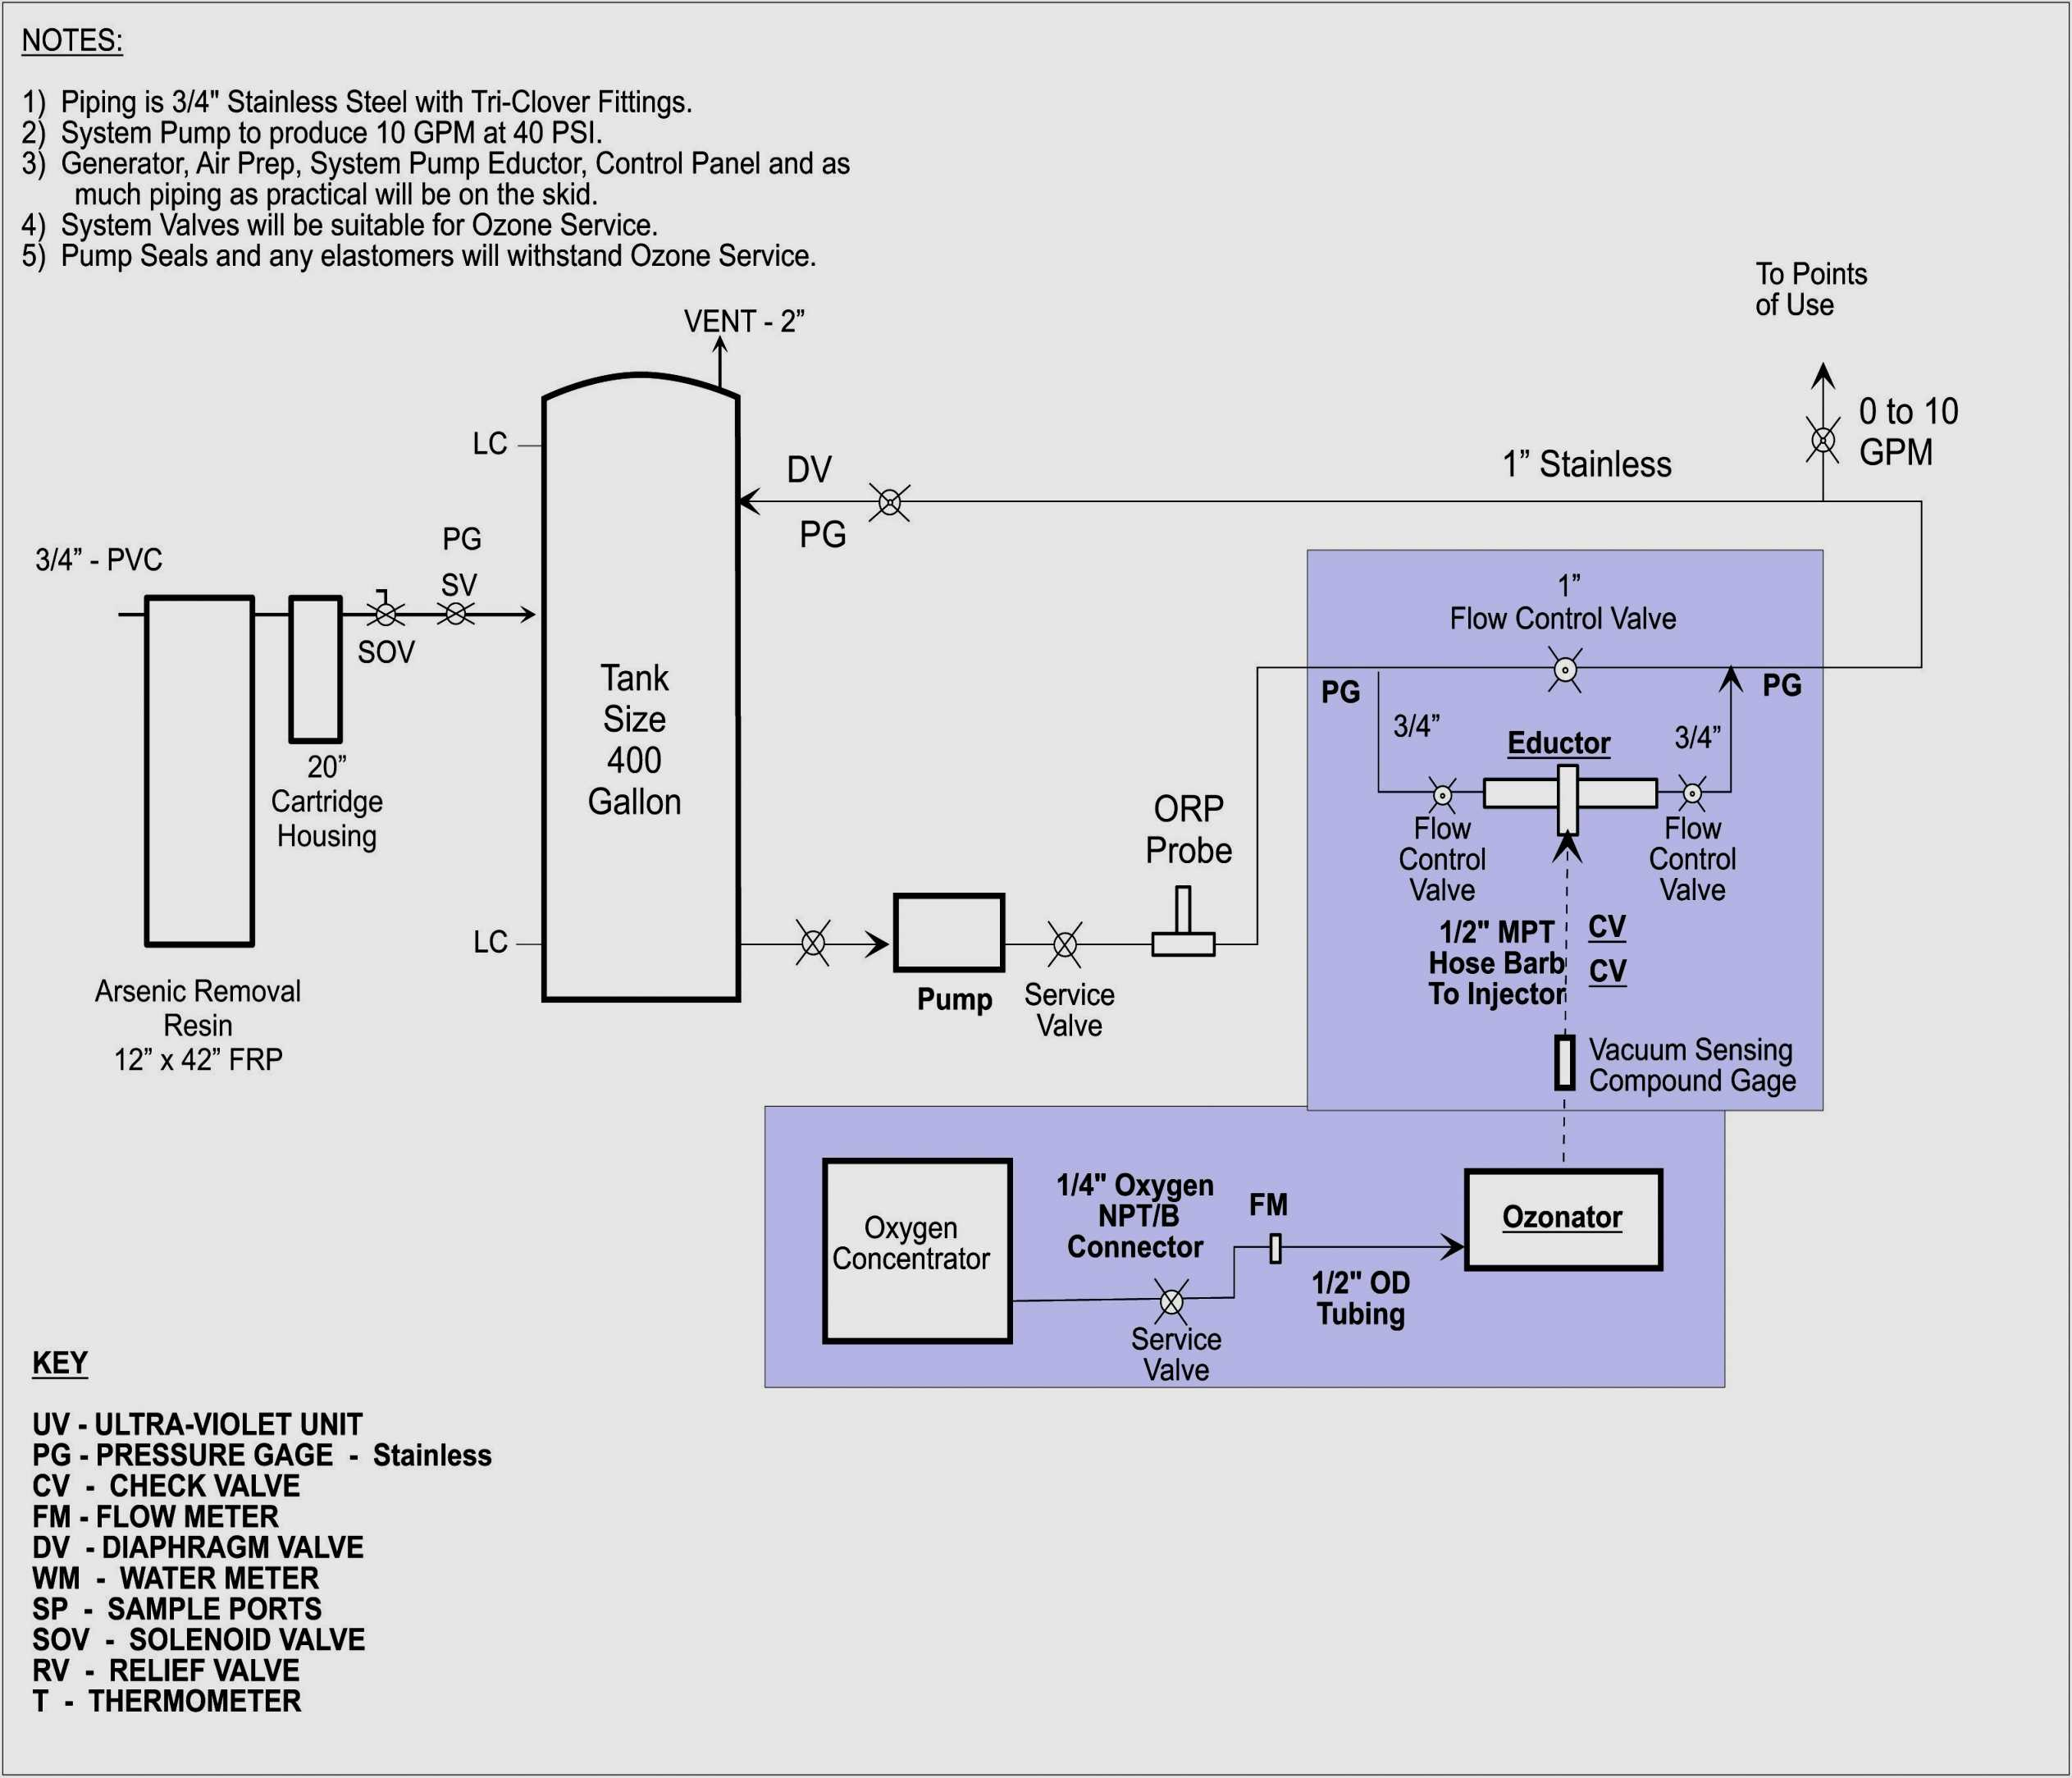 Generac Transfer Switch Wiring Diagram View Diagram - Wiring Diagram - Manual Transfer Switch Wiring Diagram